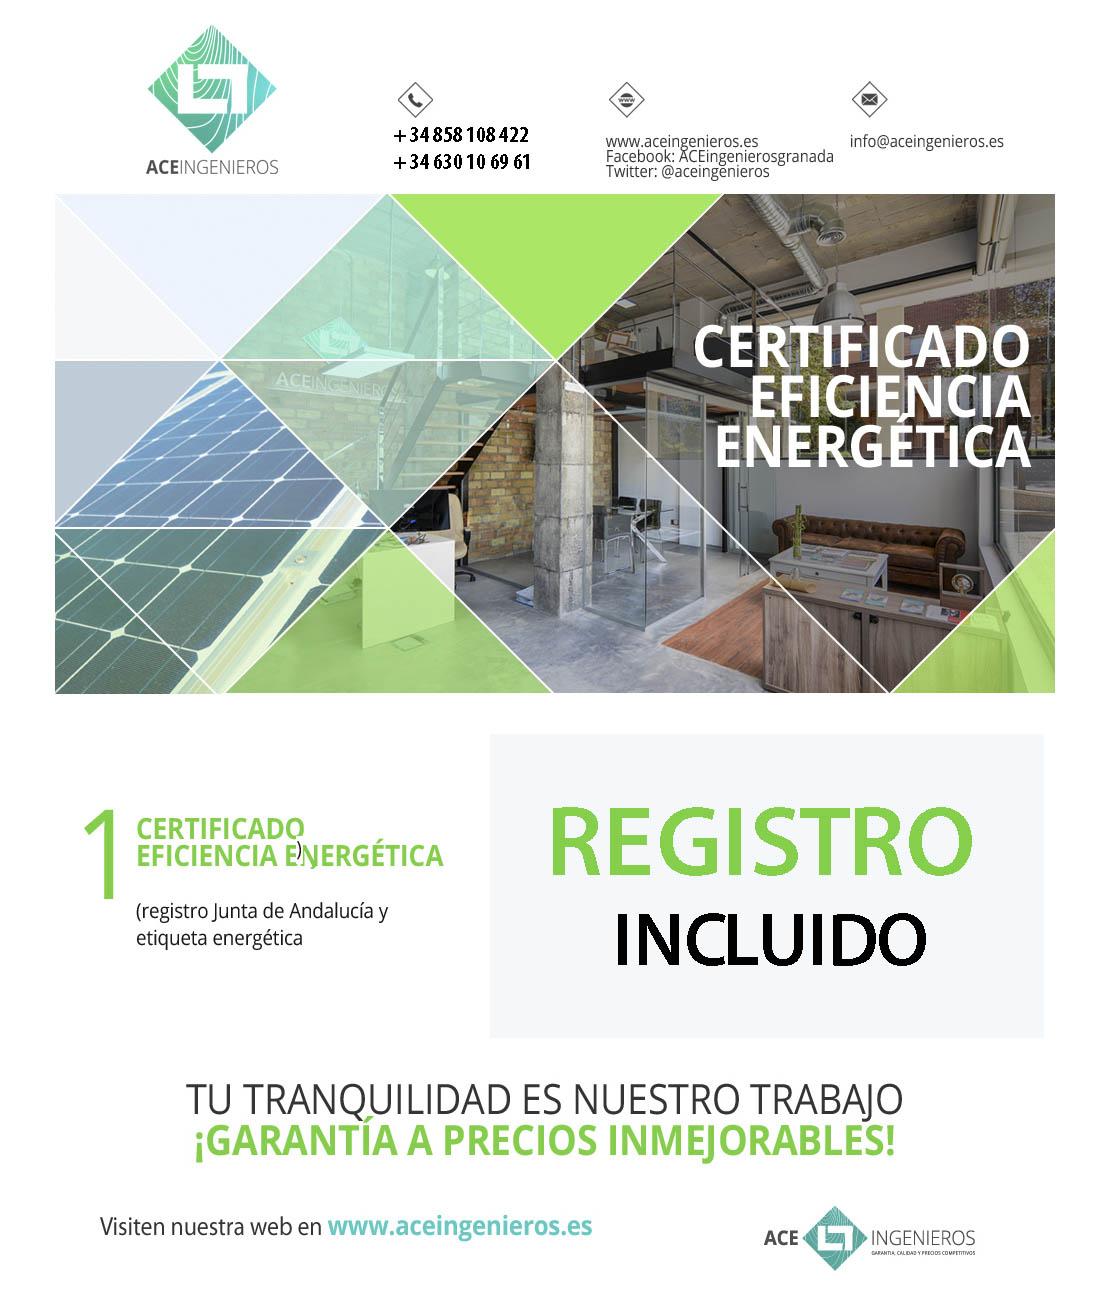 http://www.aceingenieros.es/wp-content/uploads/2019/11/cee-granada-jaen-malaga-almeria.jpg